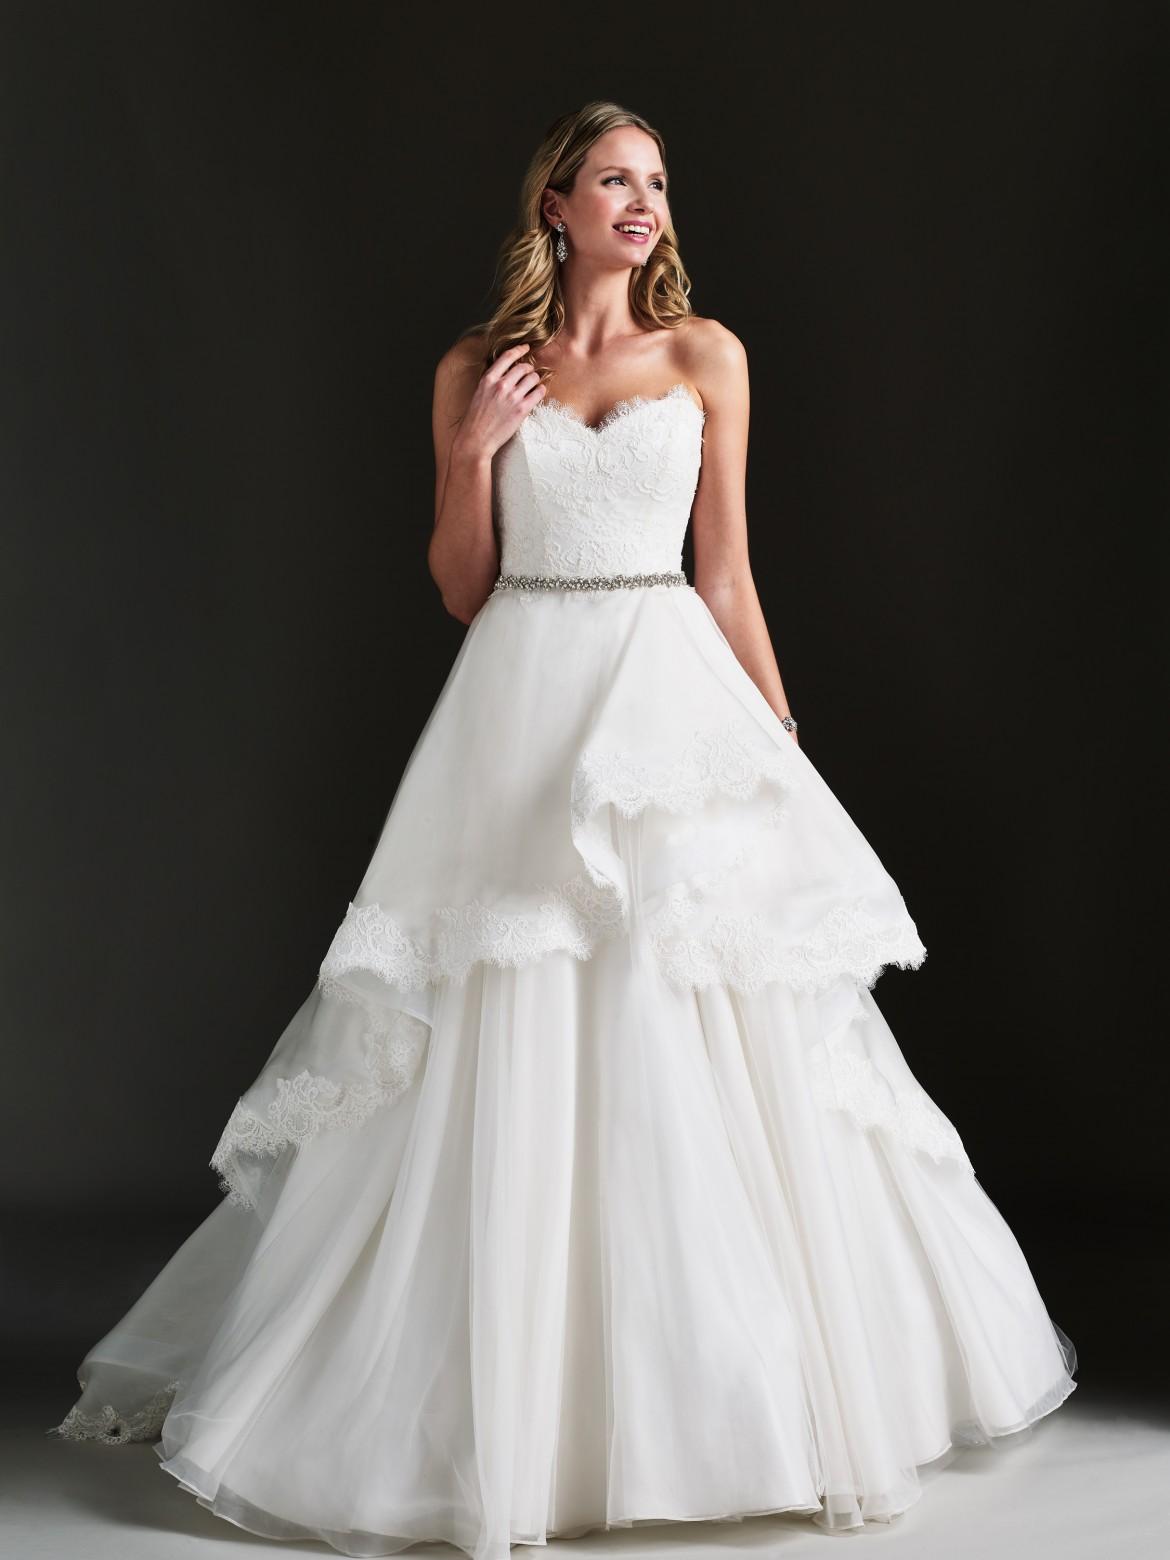 Wedding Dress Sample Sale Canada Wedding Dresses In Redlands